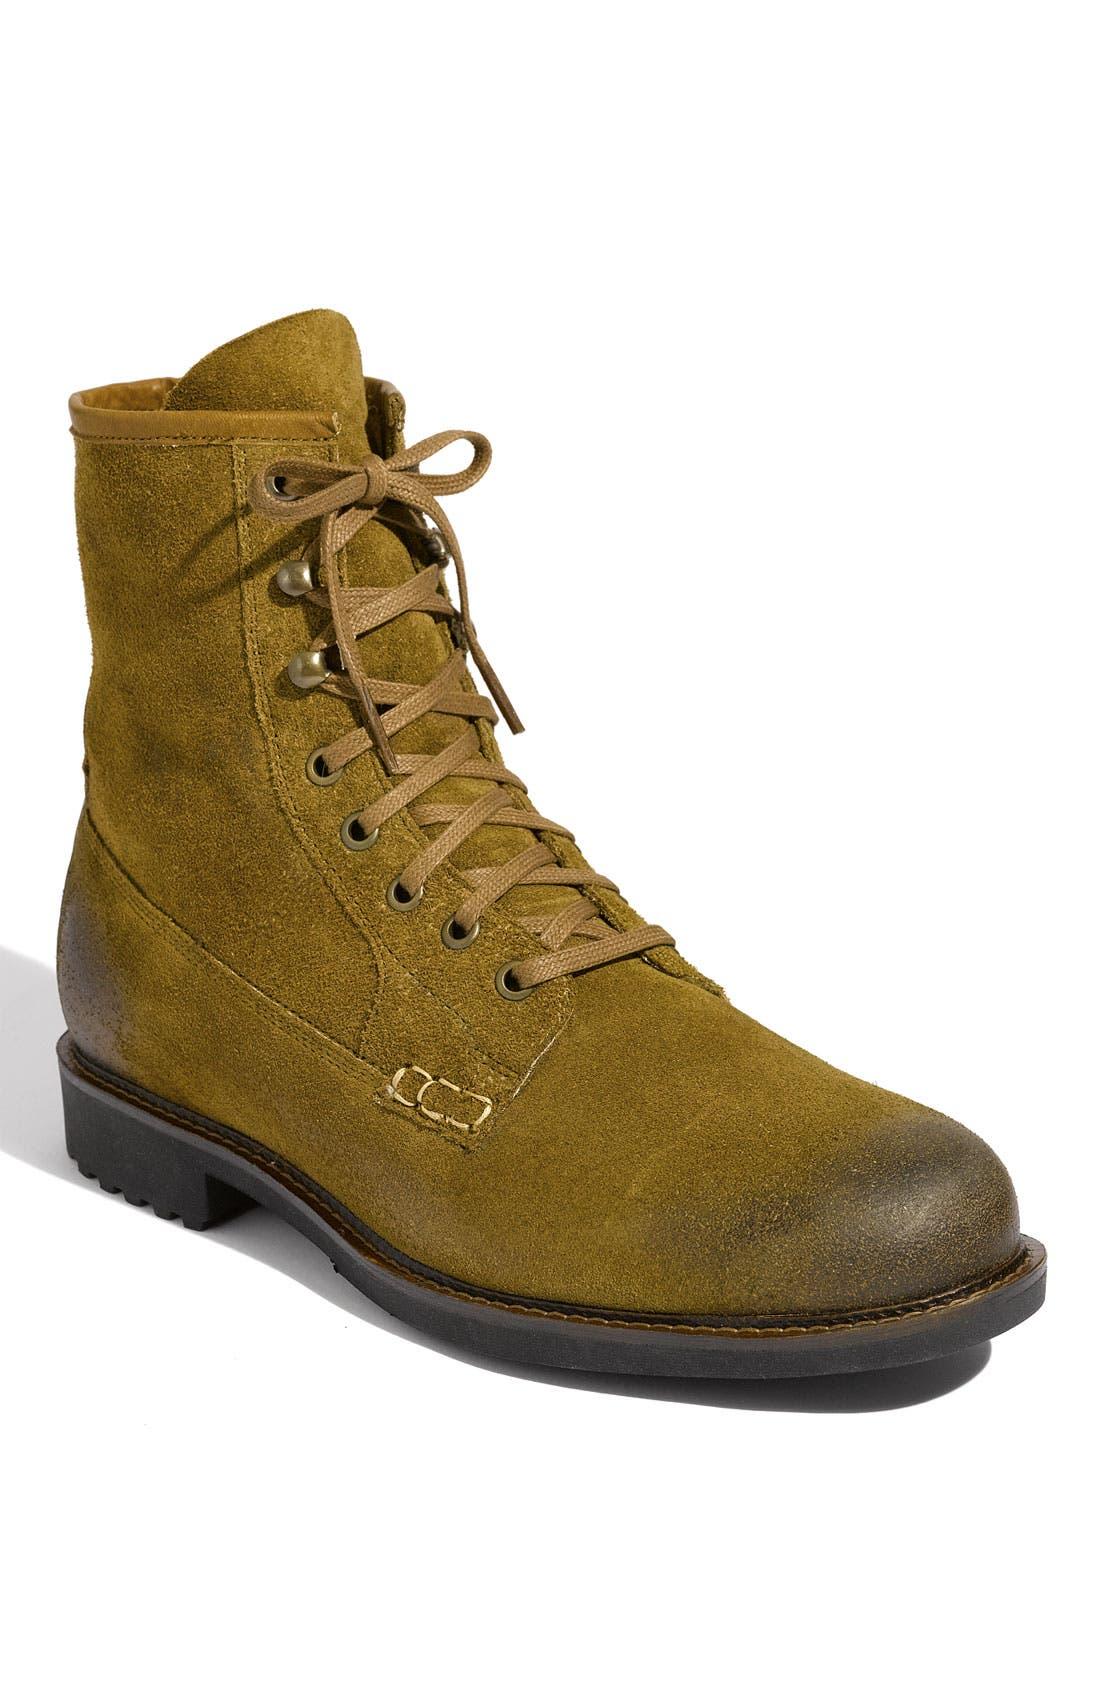 Alternate Image 1 Selected - Neil M 'Ike' Boot